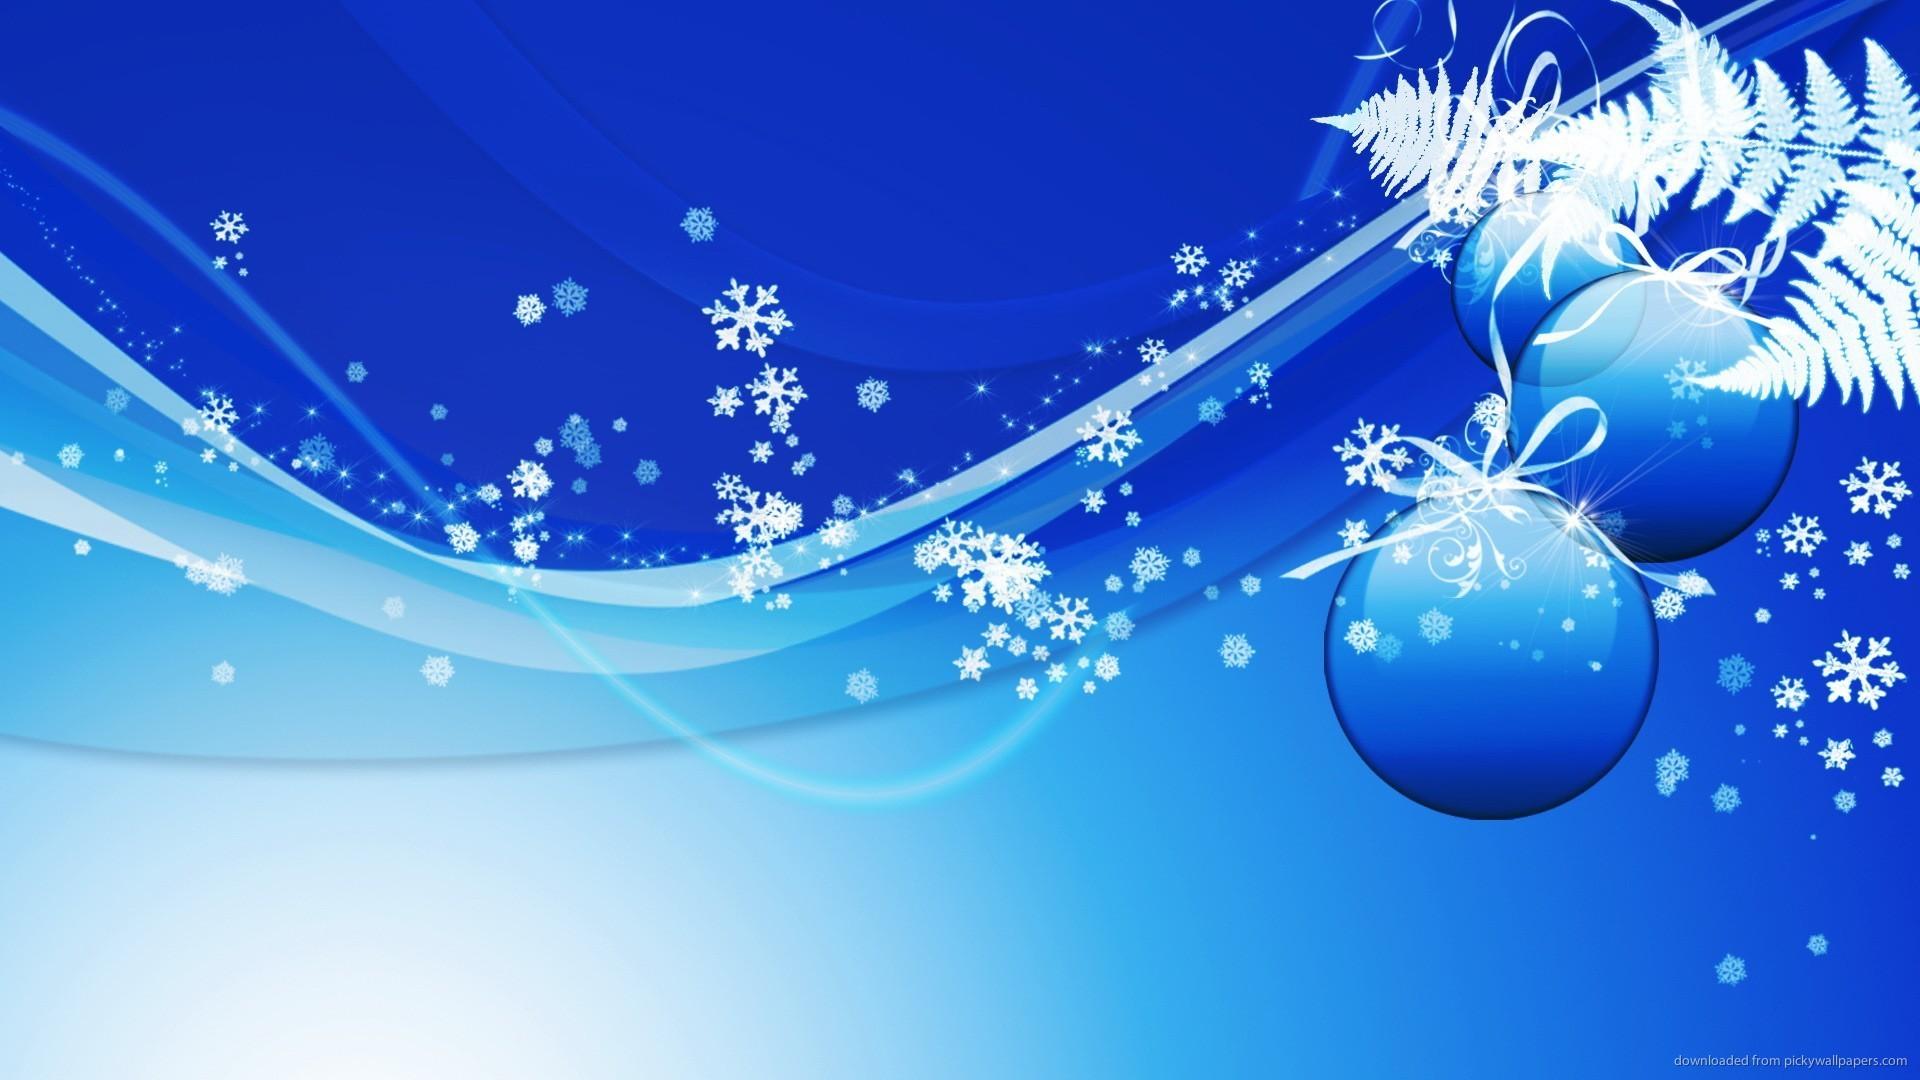 HD Blue Design Christmas Background Wallpaper 1920x1080